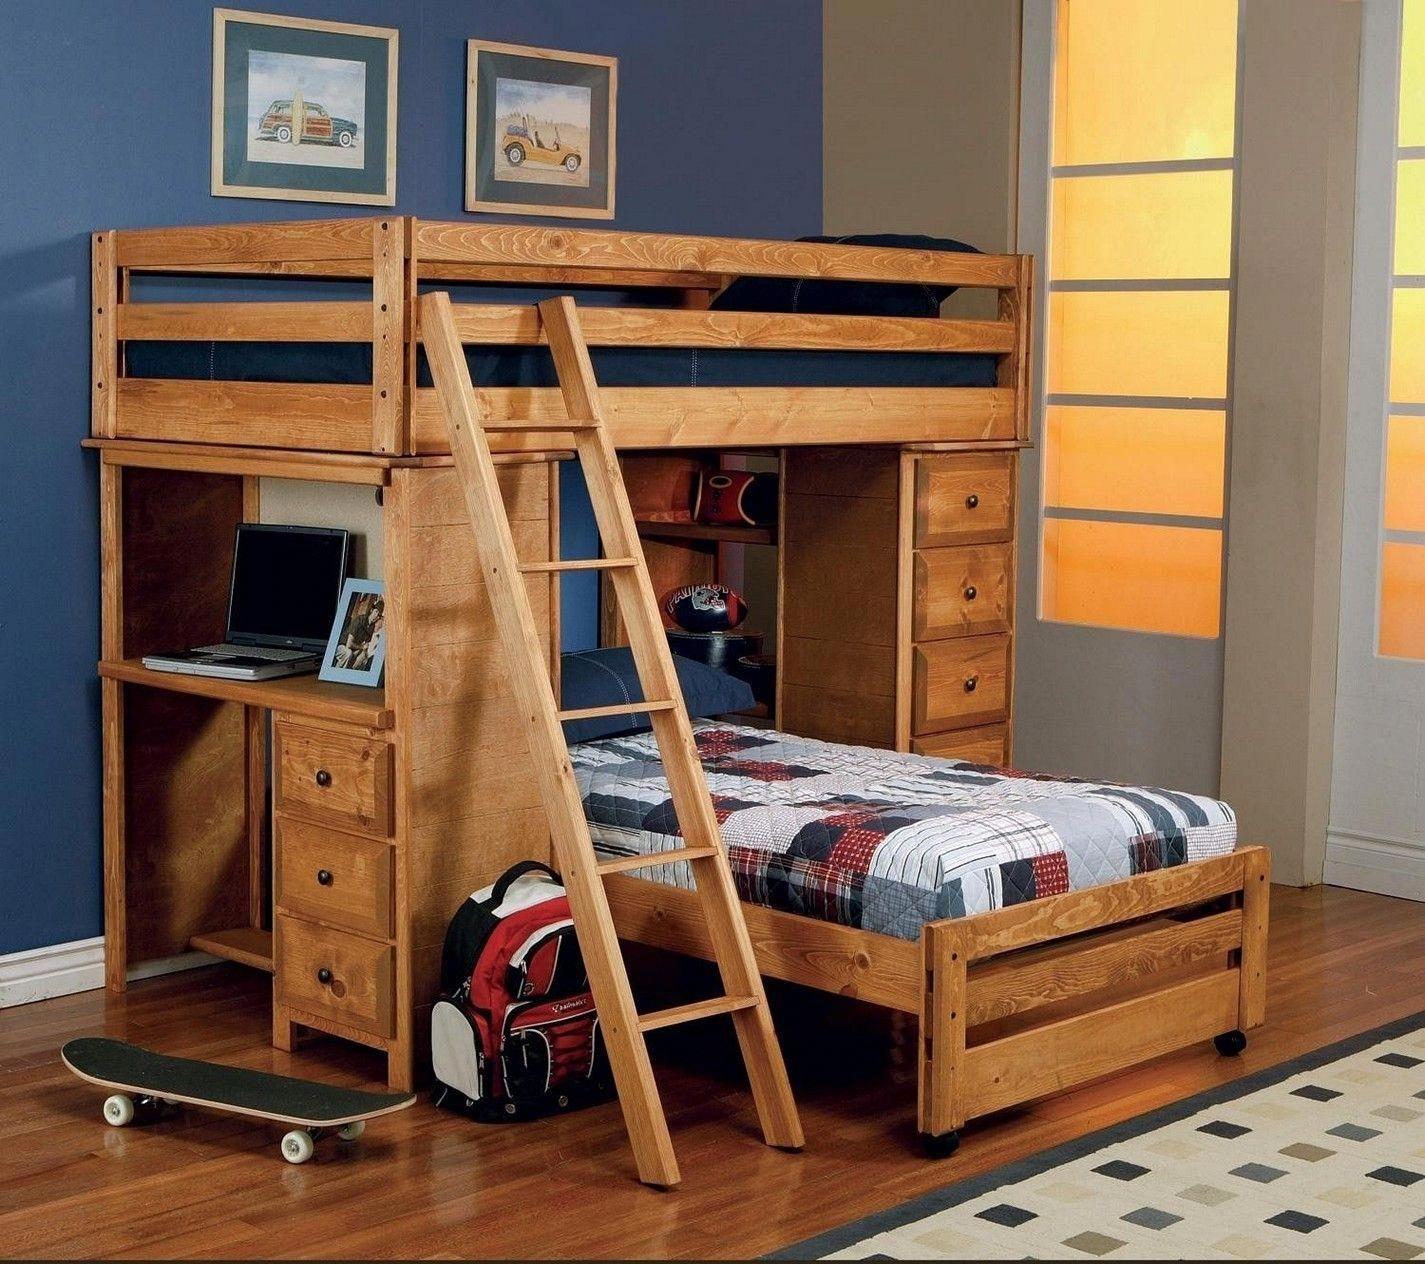 Loft bed organization ideas  Bunk Bed Ideas For Small Spaces bunkbedideasforsmallrooms  bunk